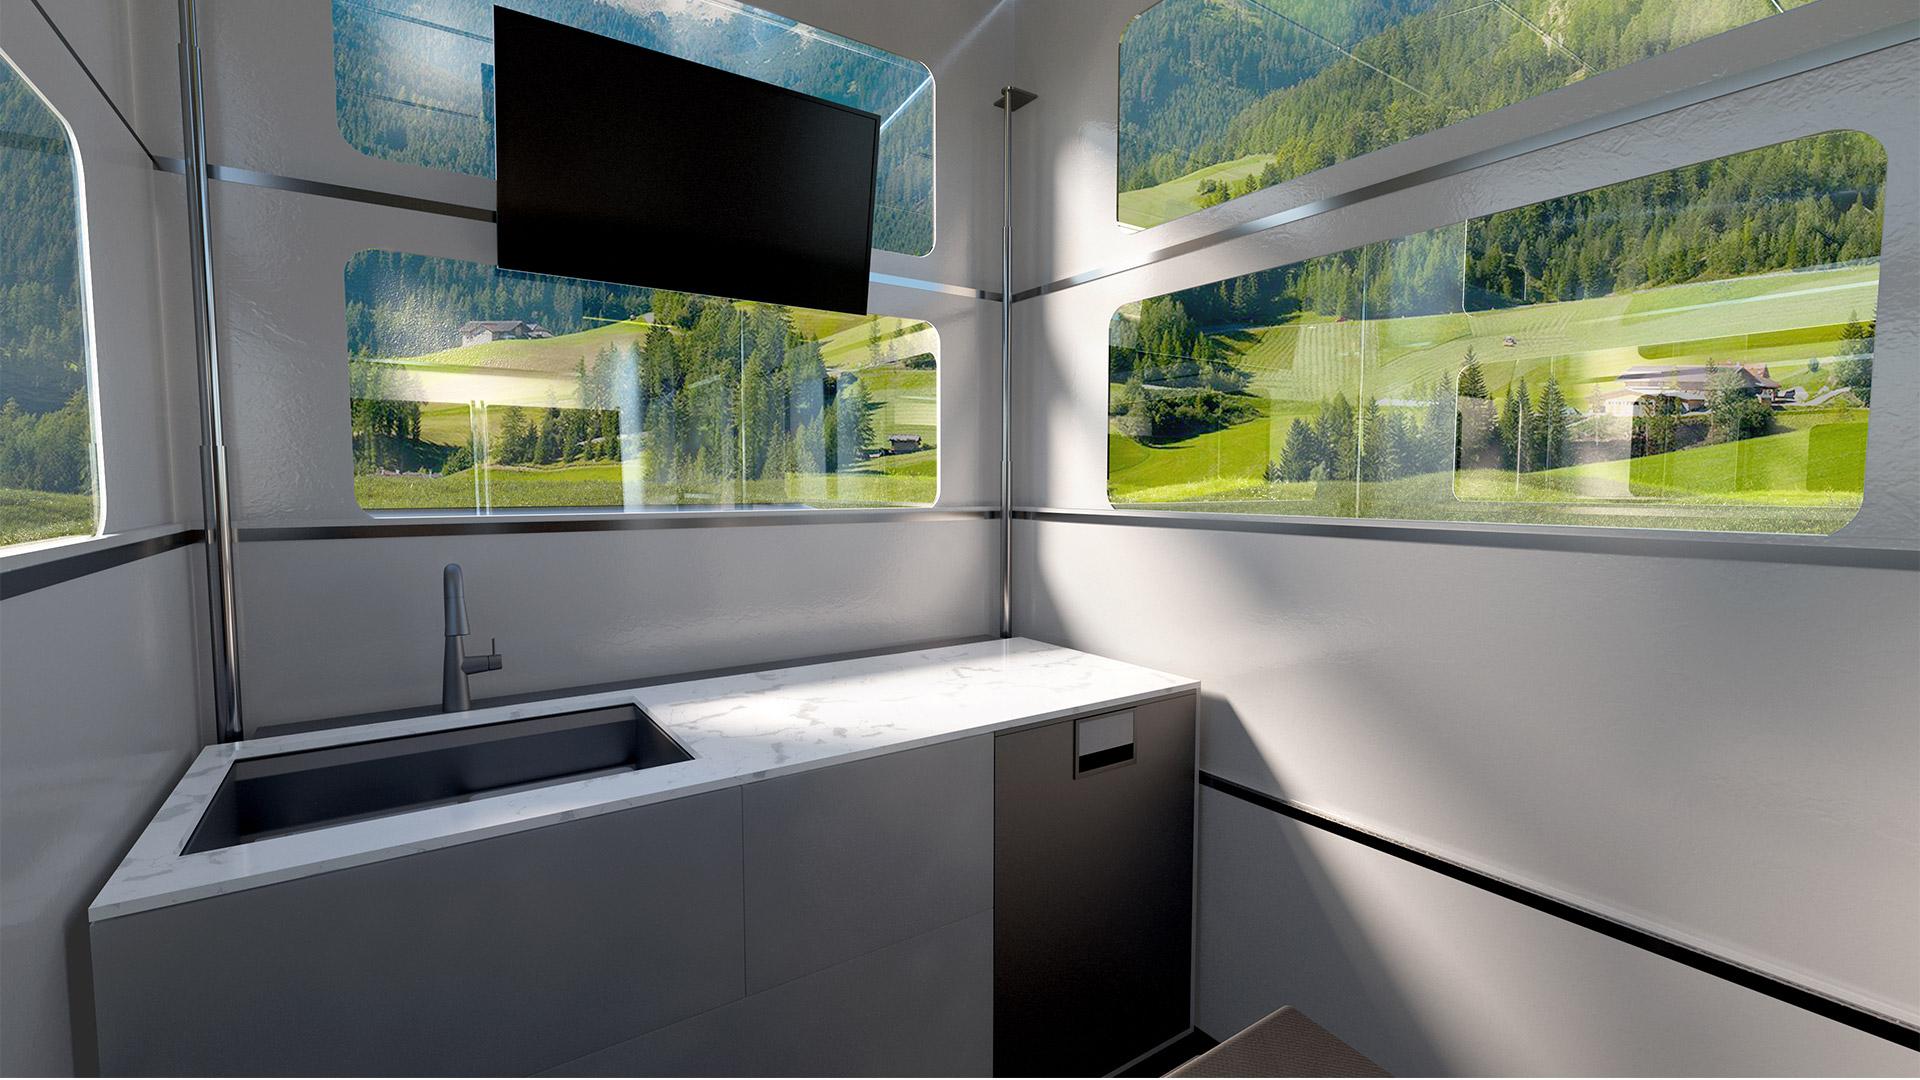 The Tesla Cybertruck CyberLandr Interior Kitchen Top with Sink